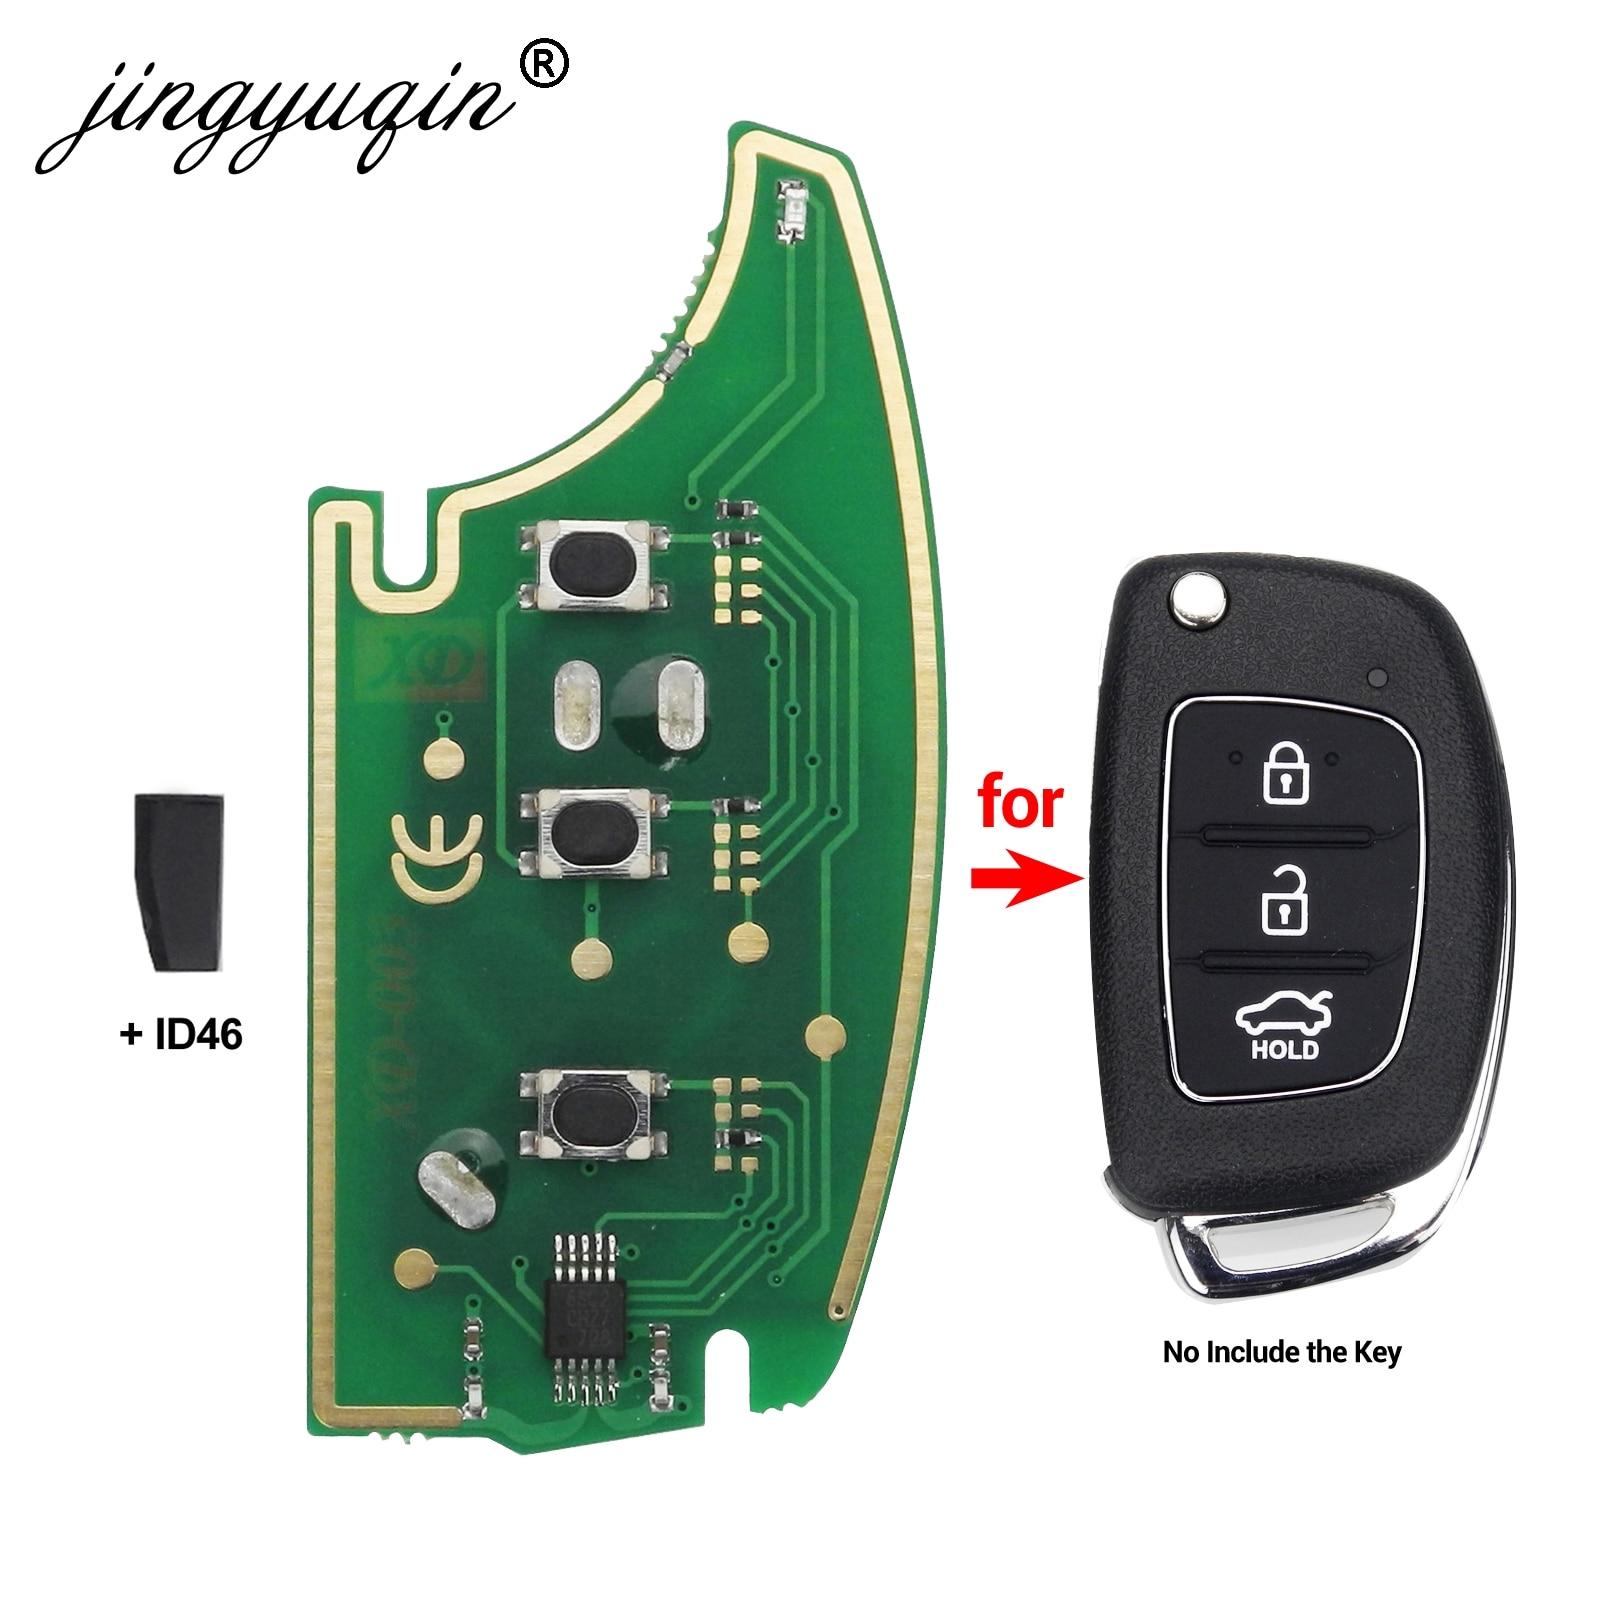 jingyuqin 433Mhz Remote Key Circuit Board For Hyundai IX35 IX25 IX45 Elantra Santa Fe 2013-2017 + Transponder Chip ID46jingyuqin 433Mhz Remote Key Circuit Board For Hyundai IX35 IX25 IX45 Elantra Santa Fe 2013-2017 + Transponder Chip ID46